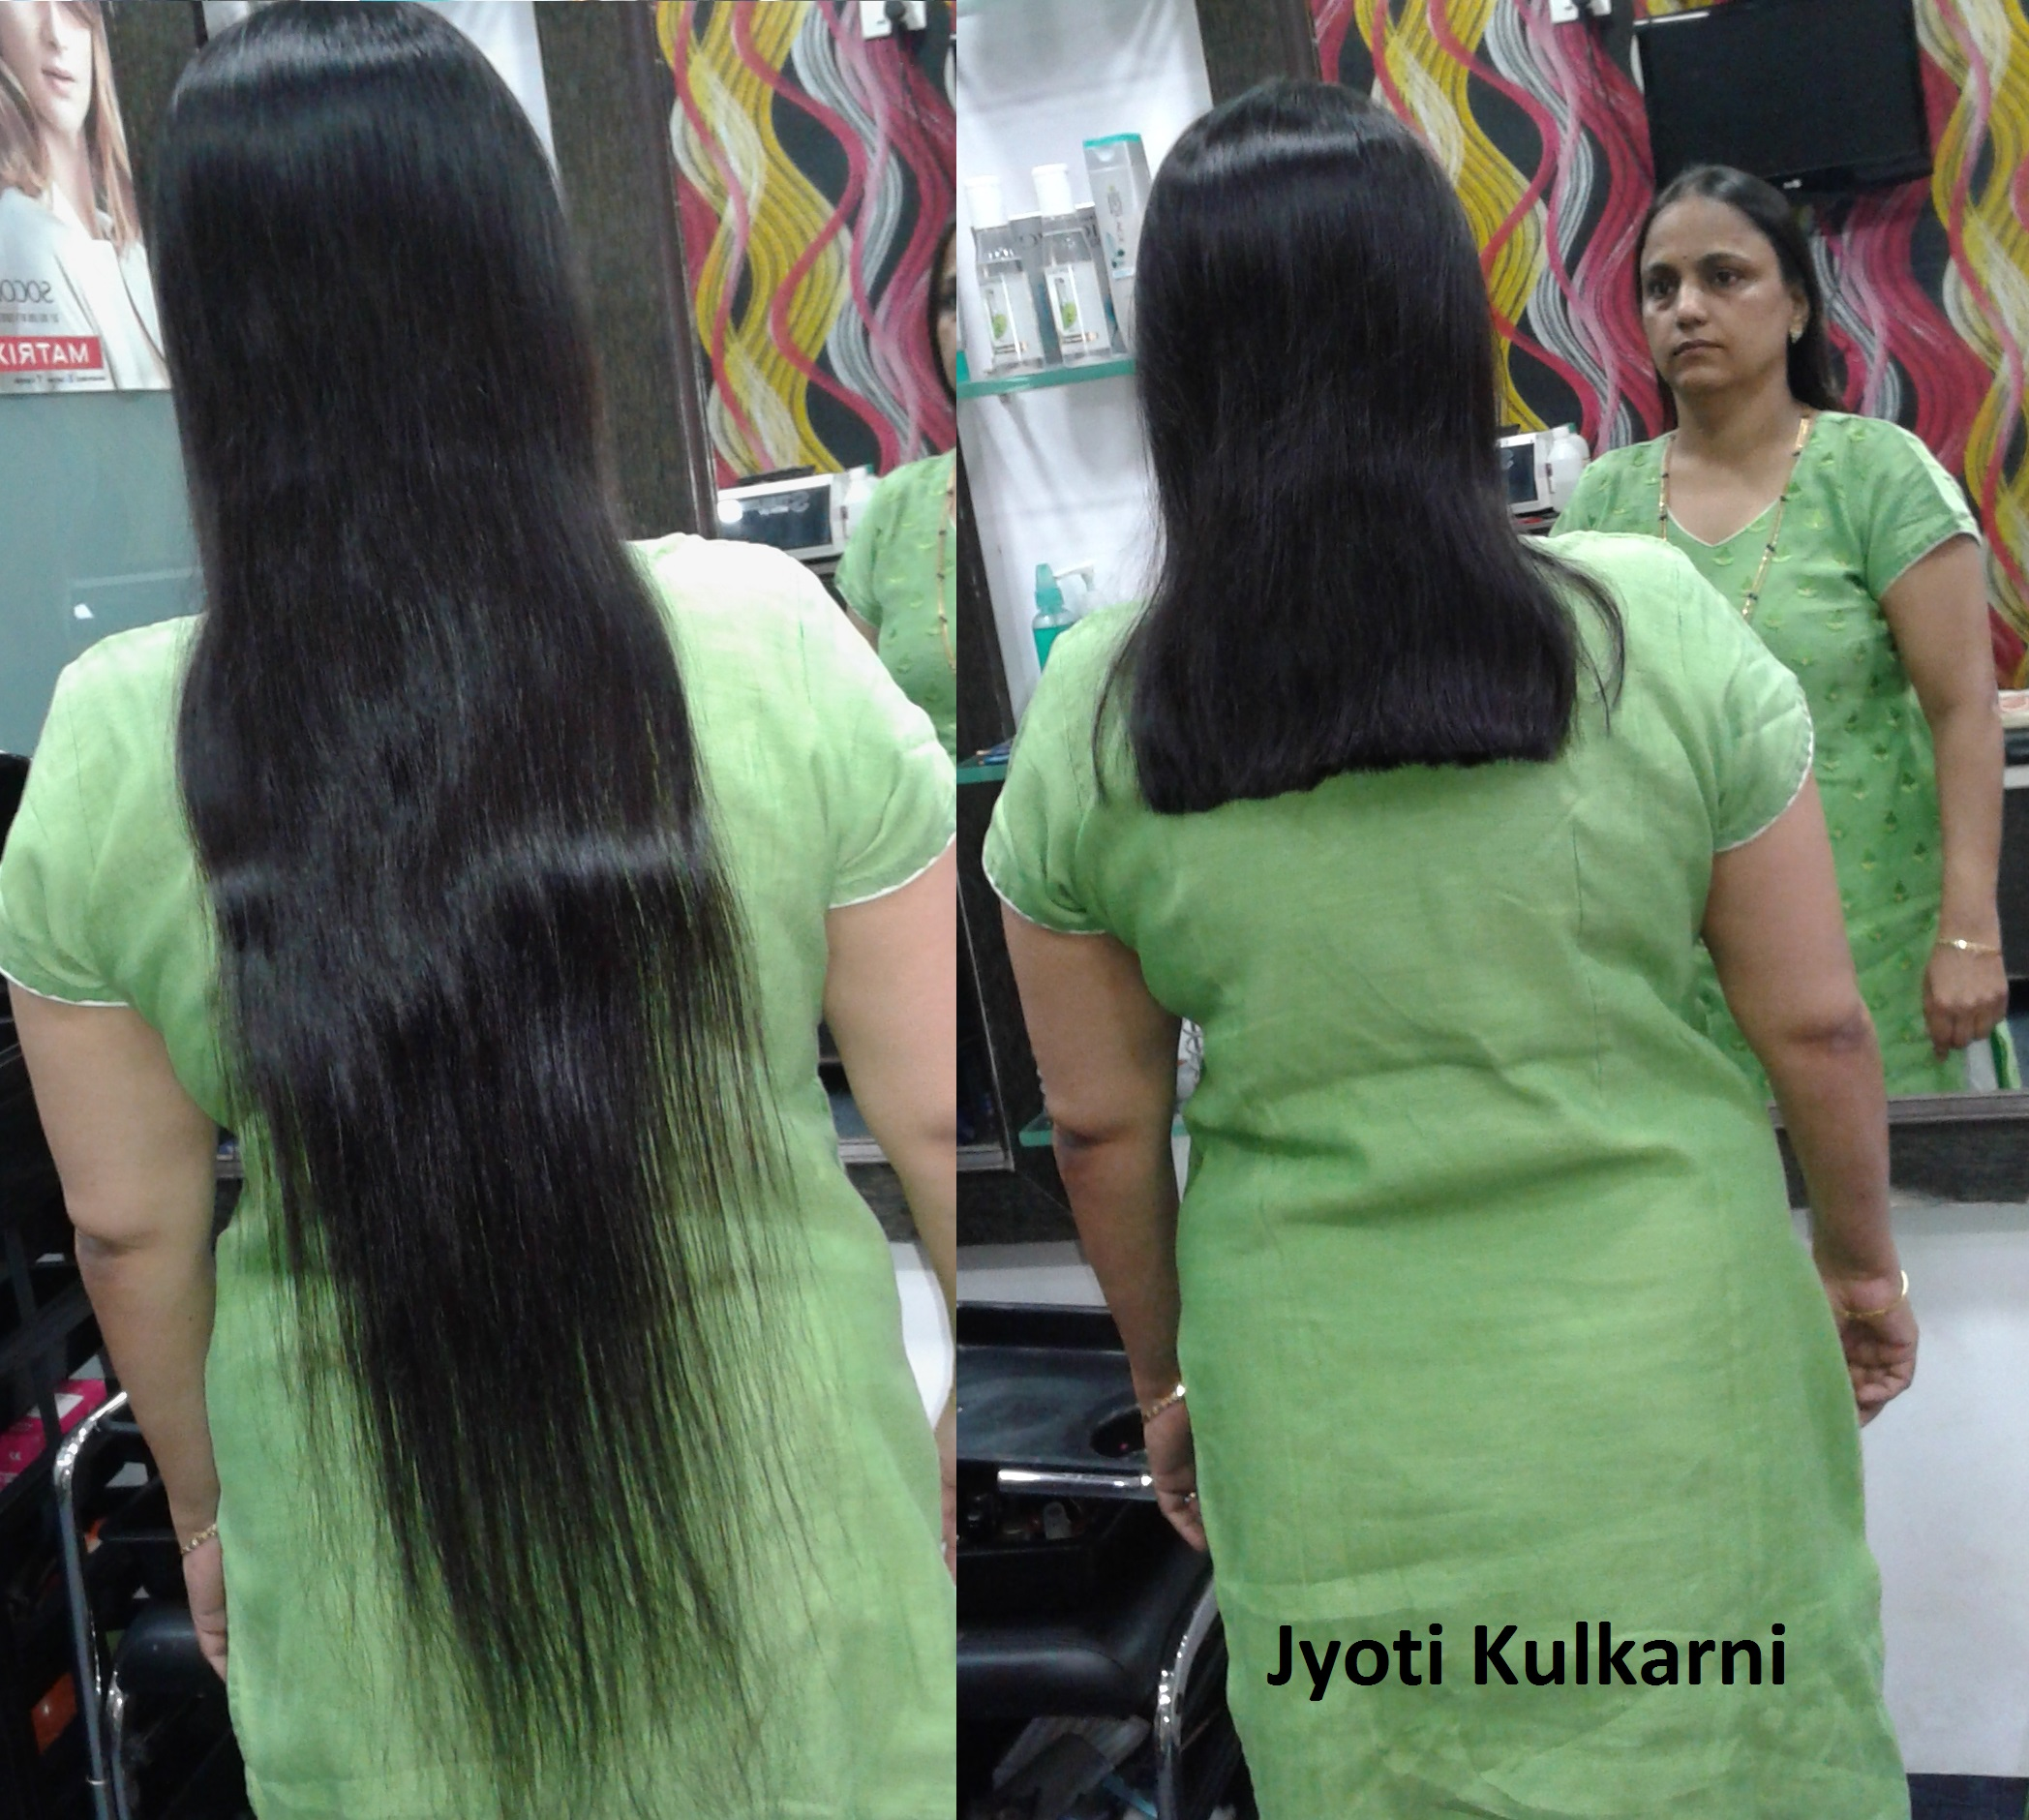 Jyoti Kulkarni